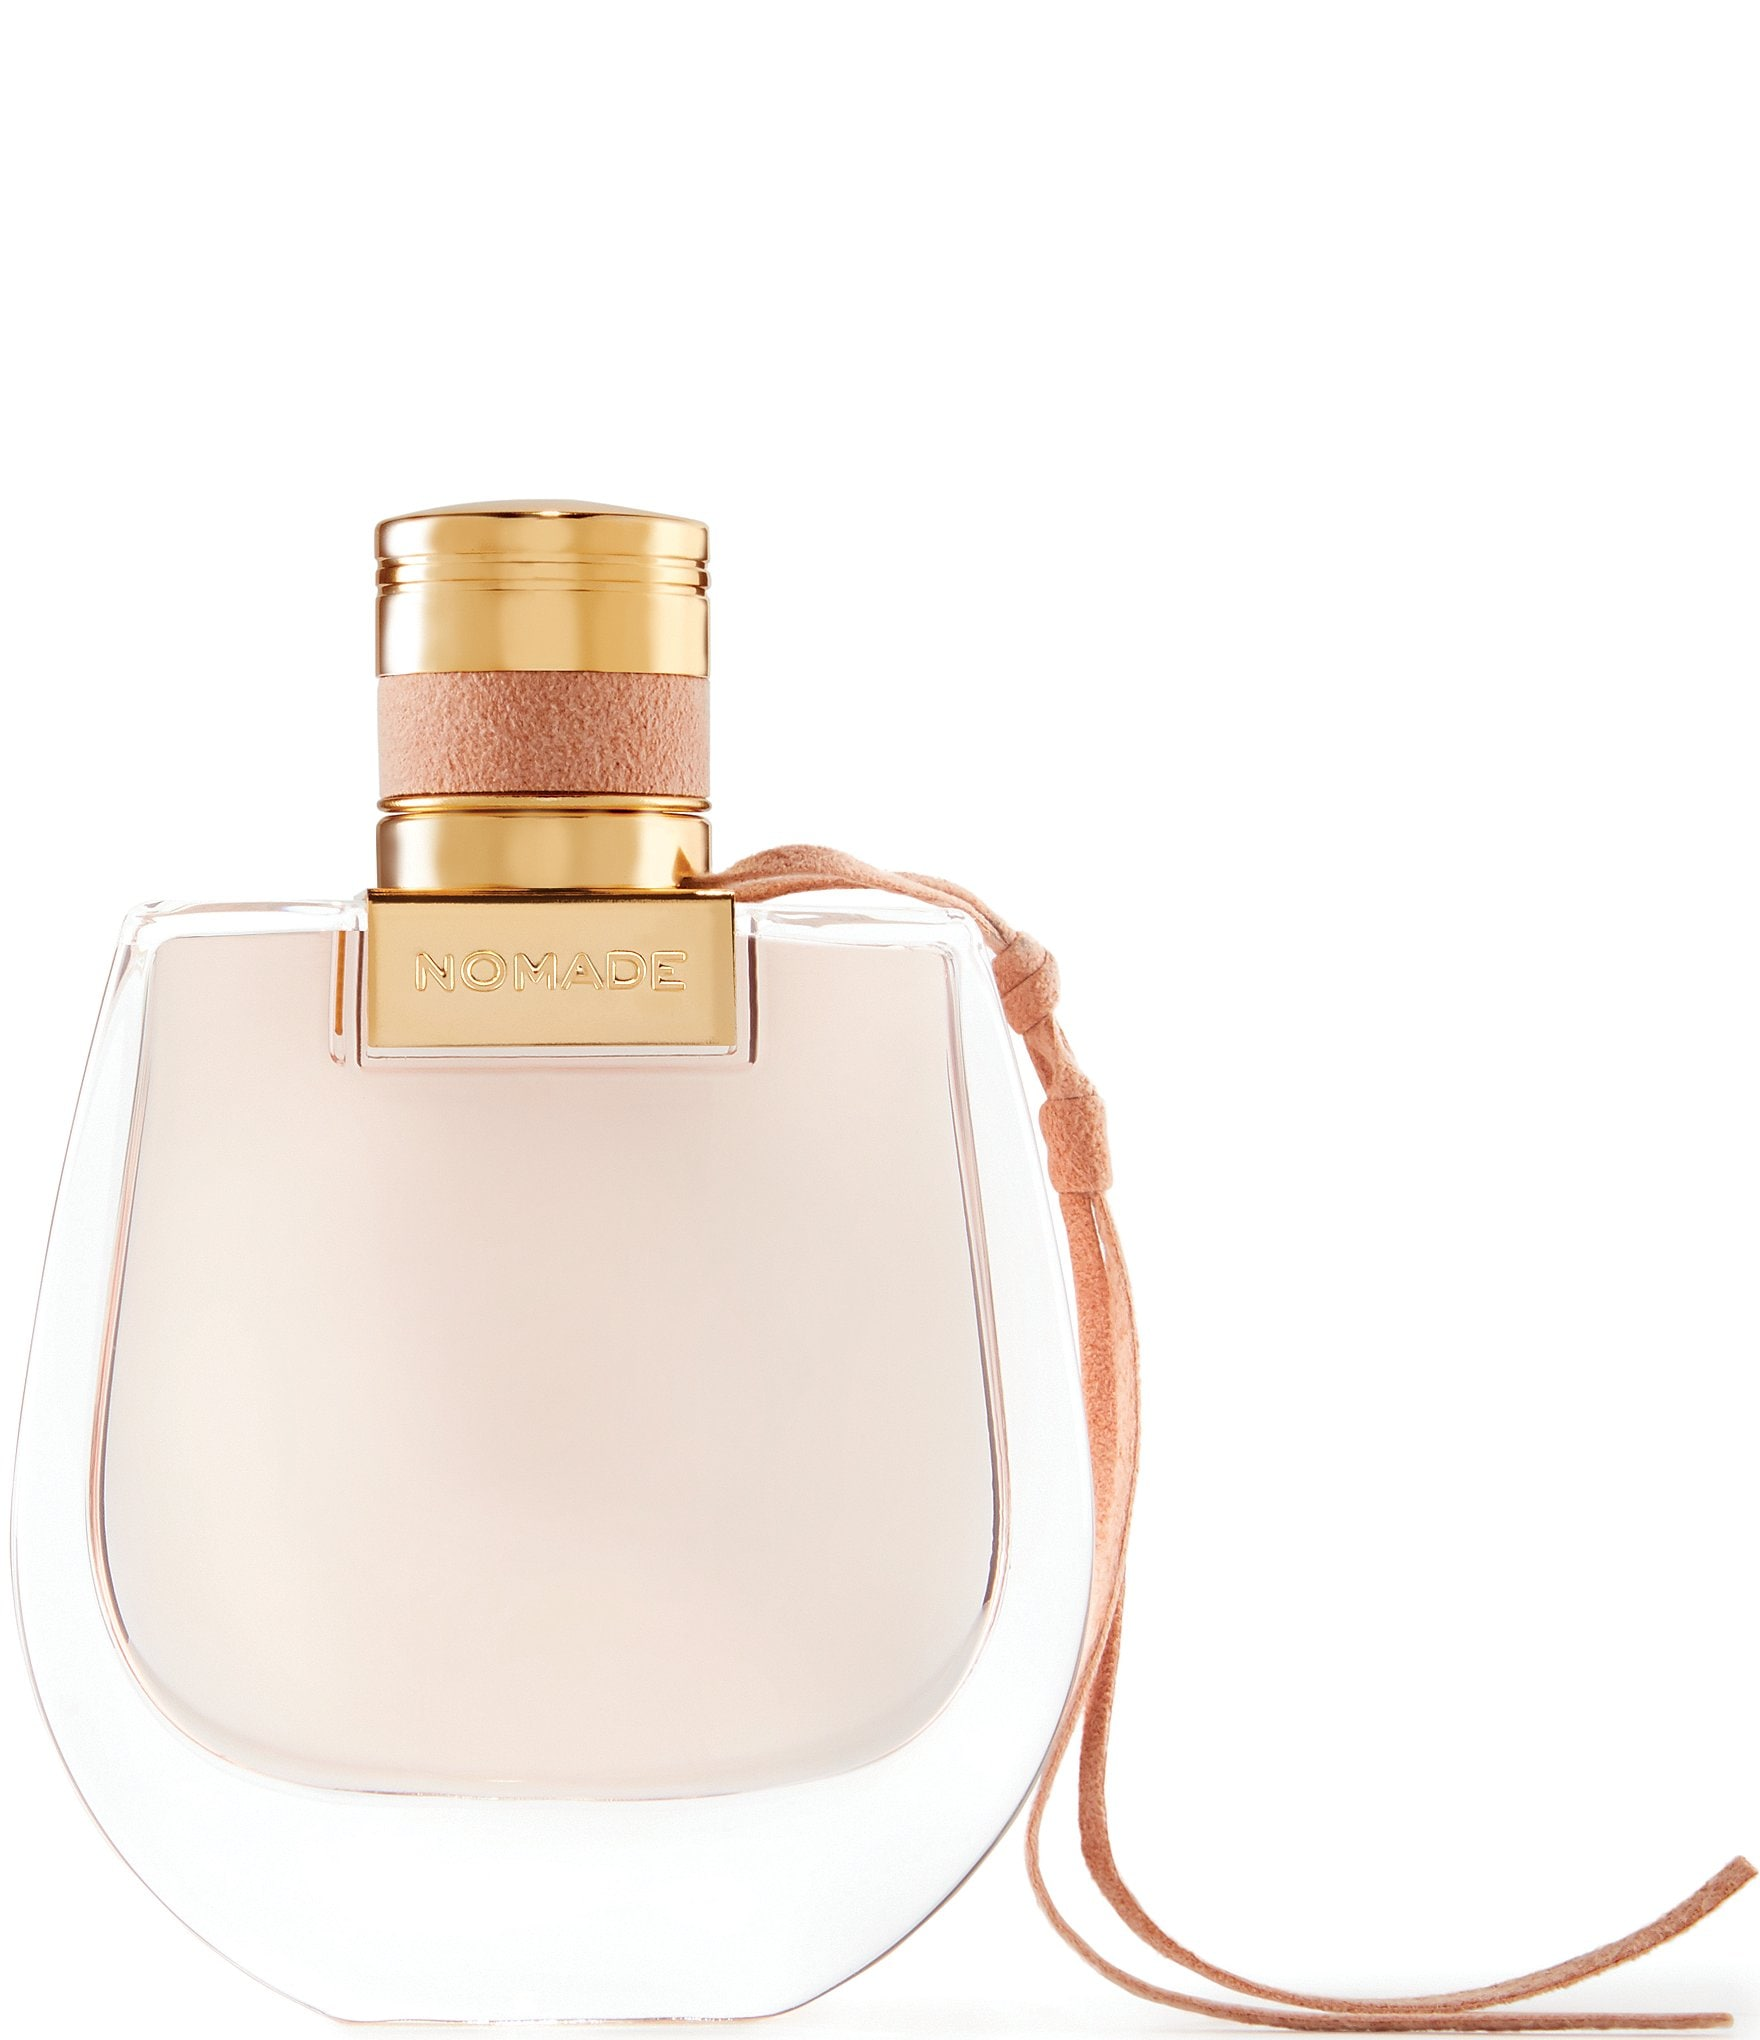 Chloe Nomade Eau de Parfum Spray | Dillard's